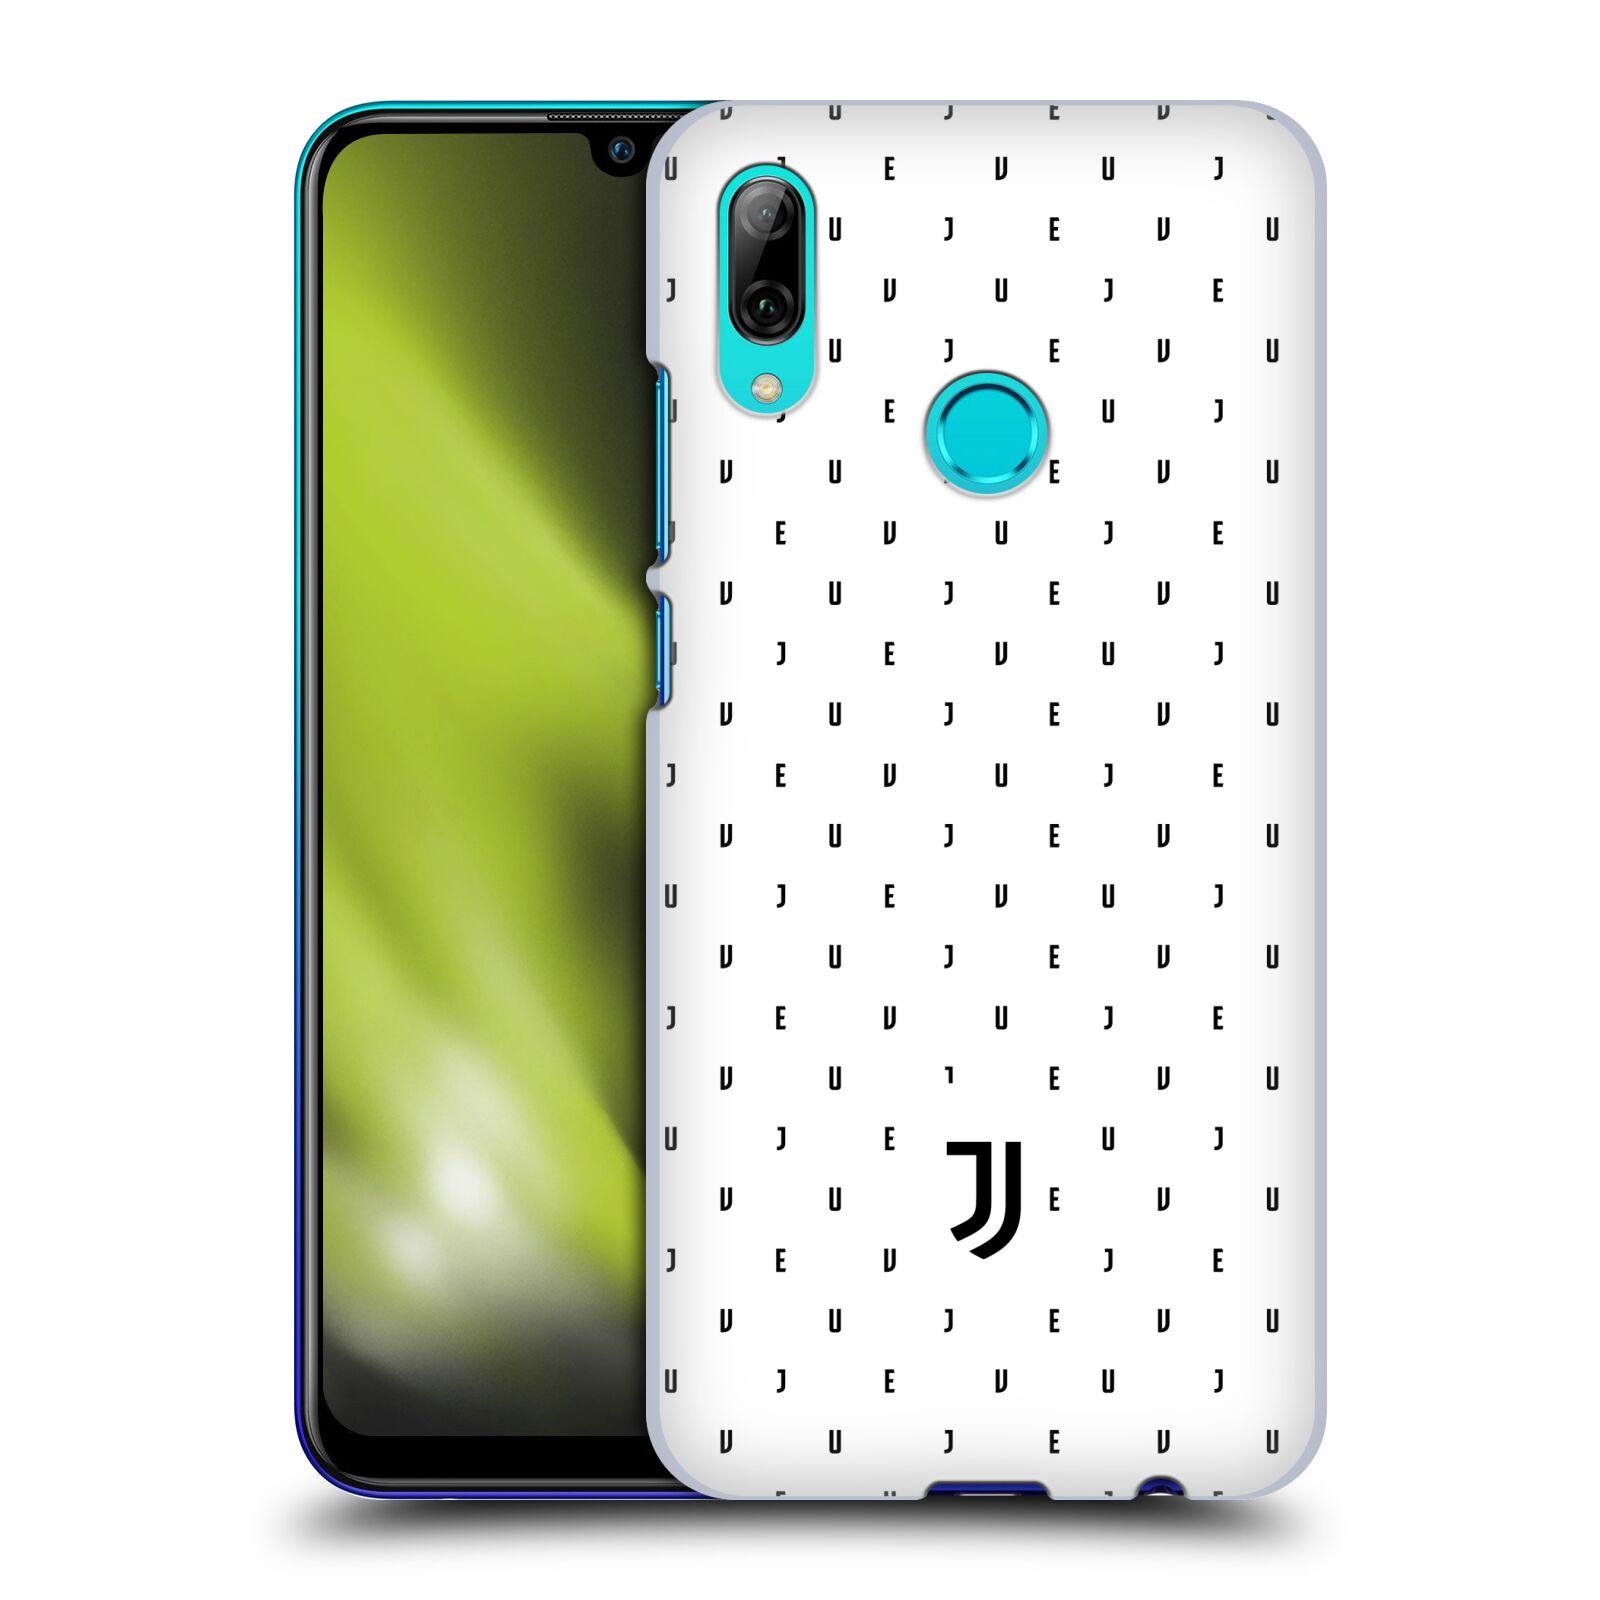 Plastové pouzdro na mobil Huawei P Smart (2019) - Head Case - Juventus FC - Nové logo - Decentní